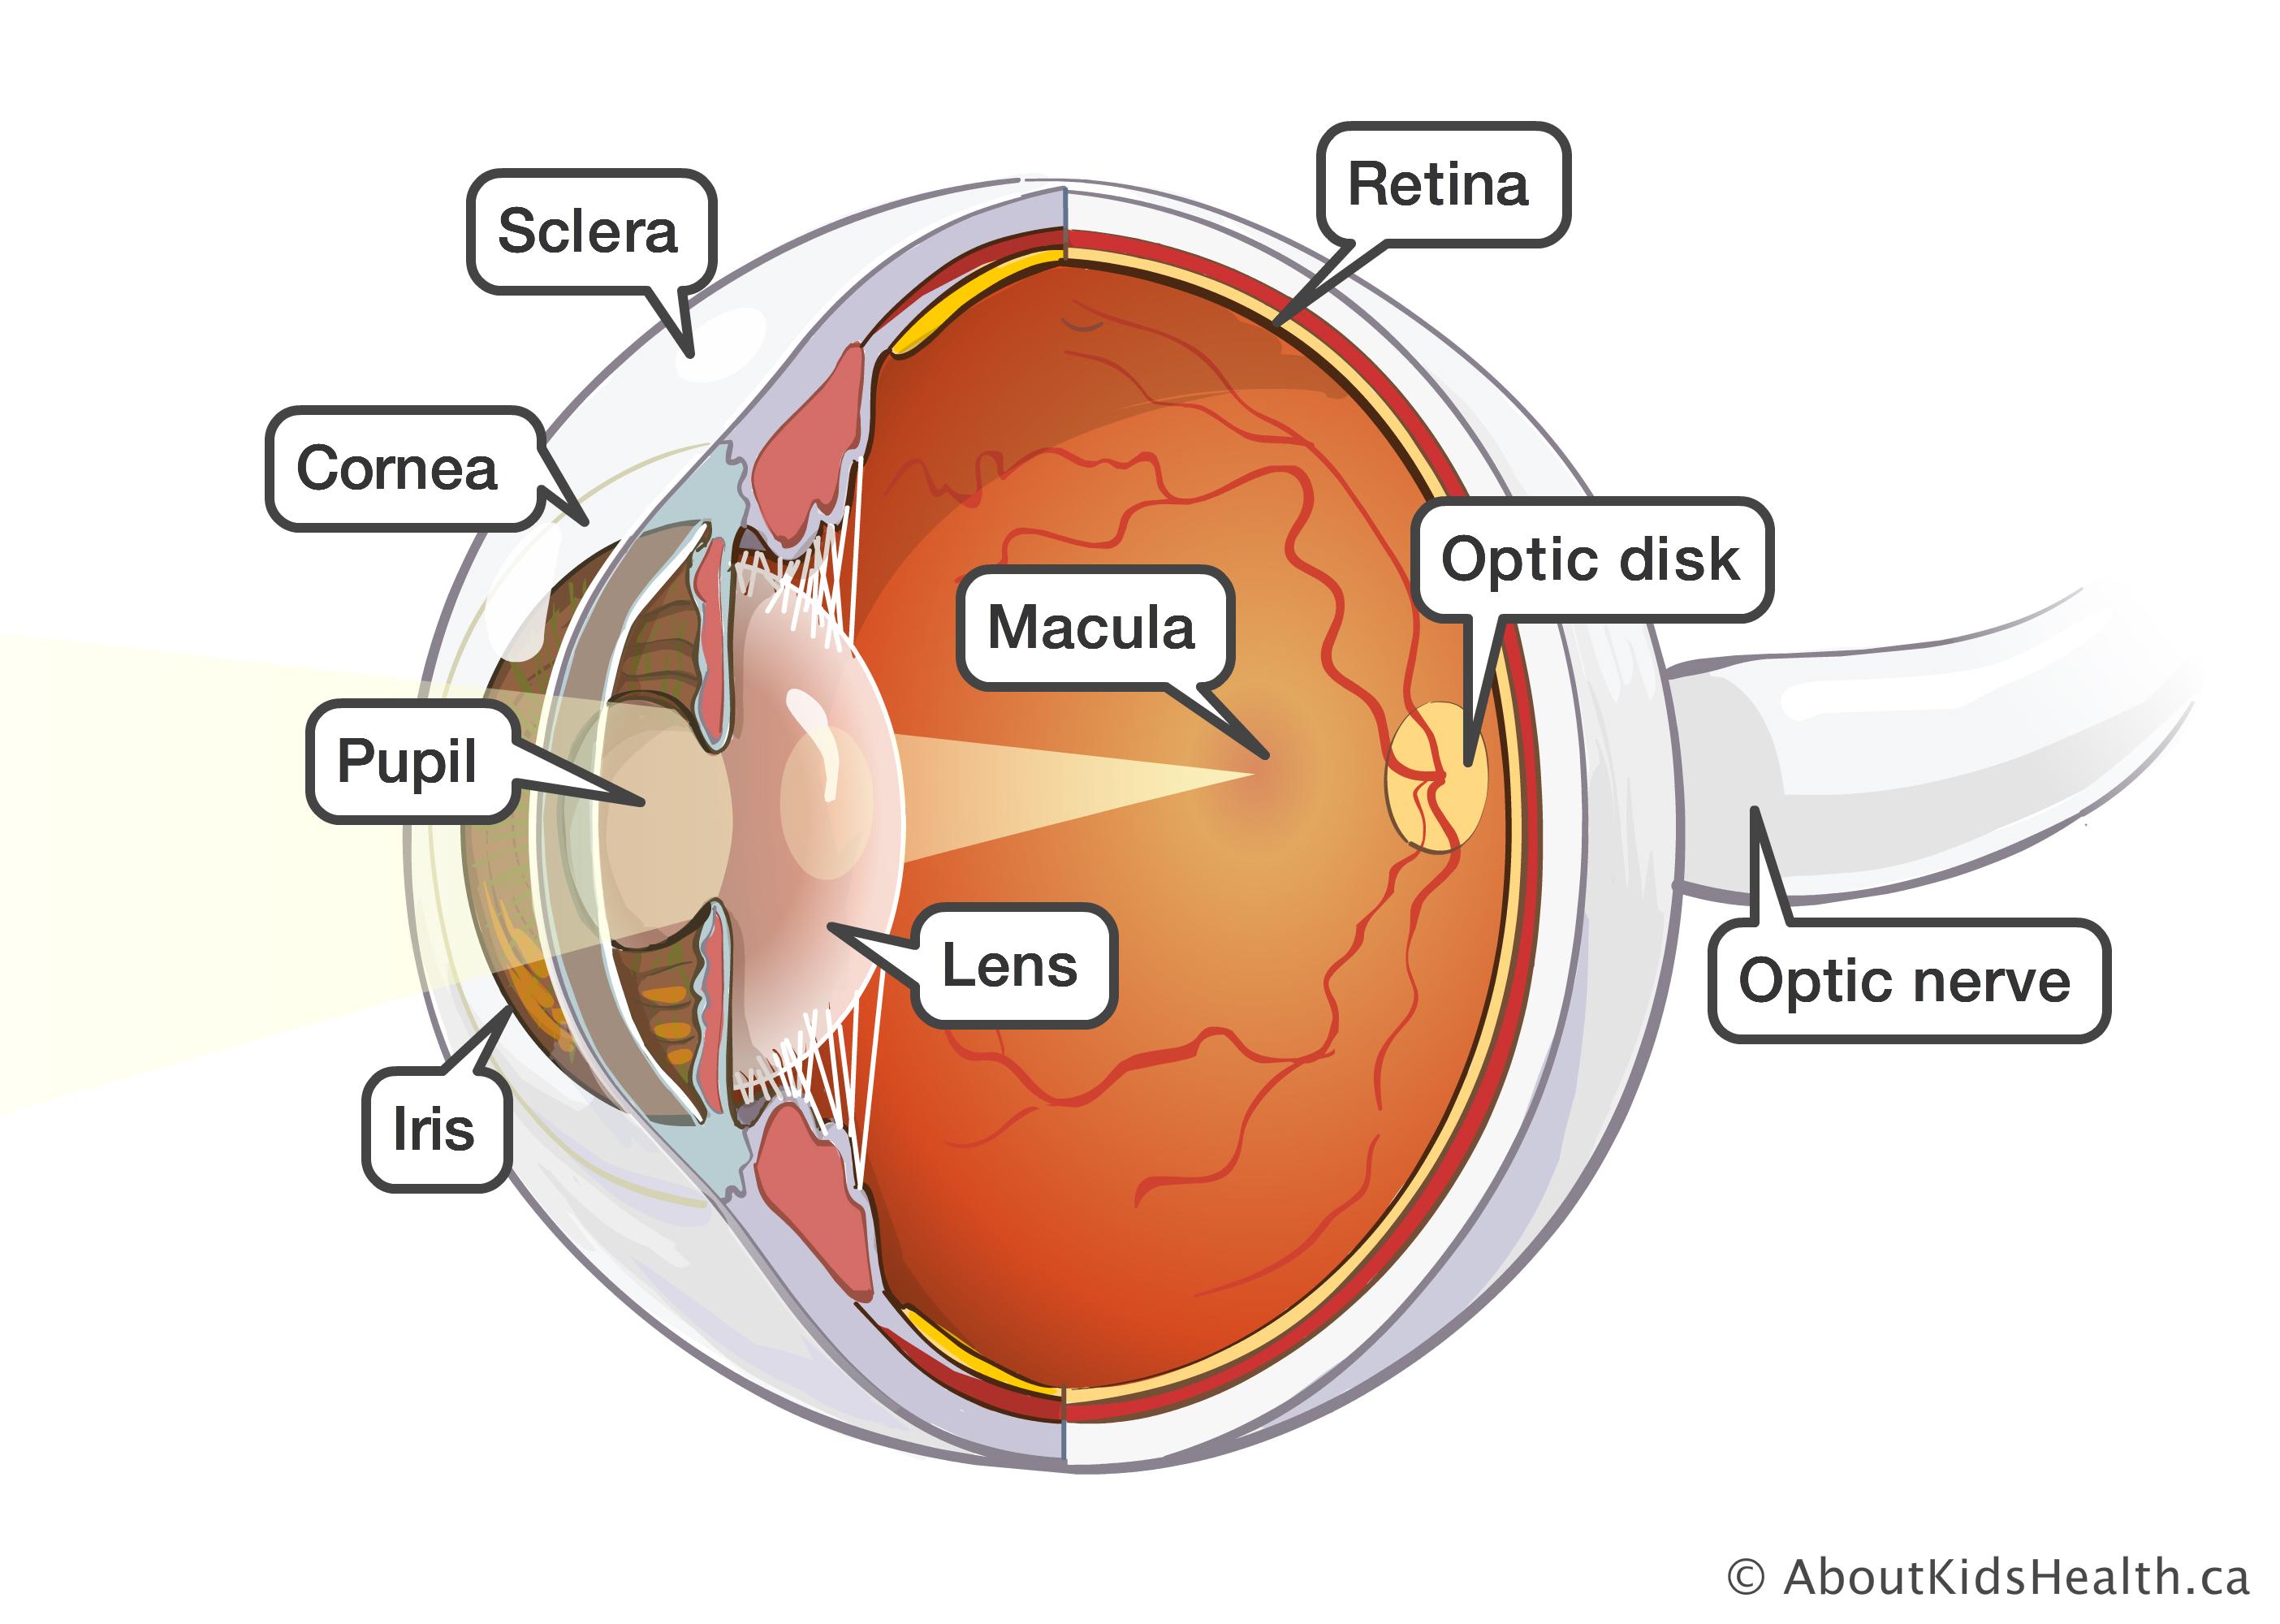 hight resolution of eye anatomy and function diagram of parts of the eye diagram of parts of the eye